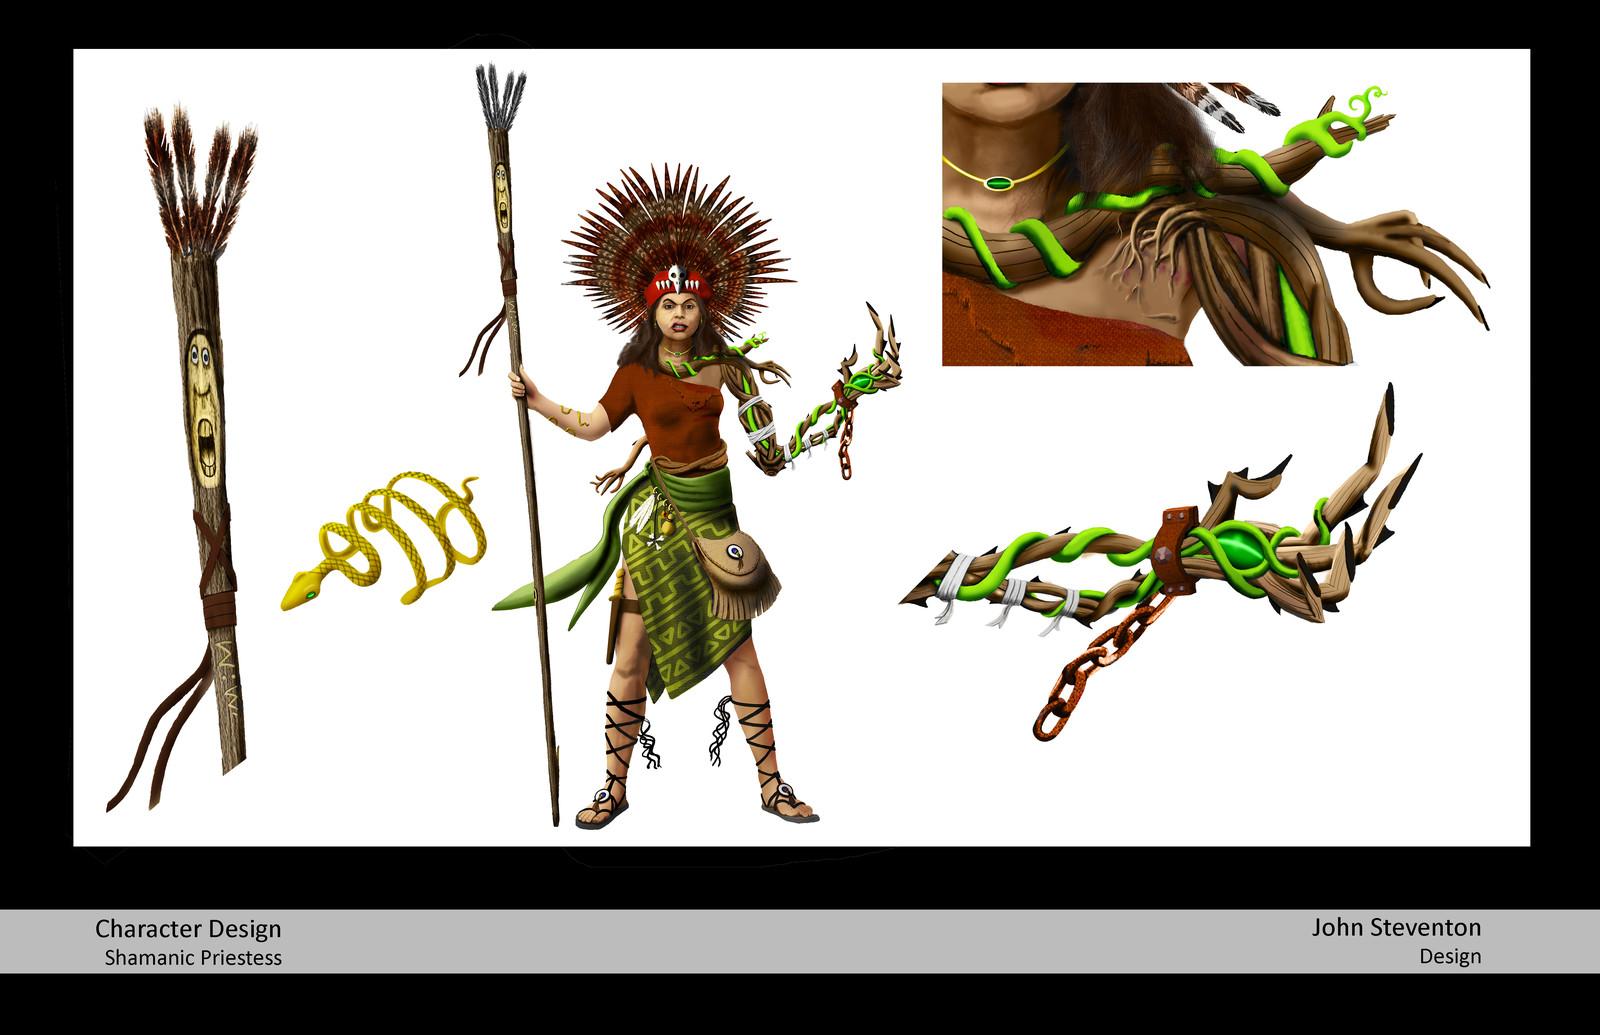 Shamanic Priestess: Character Design